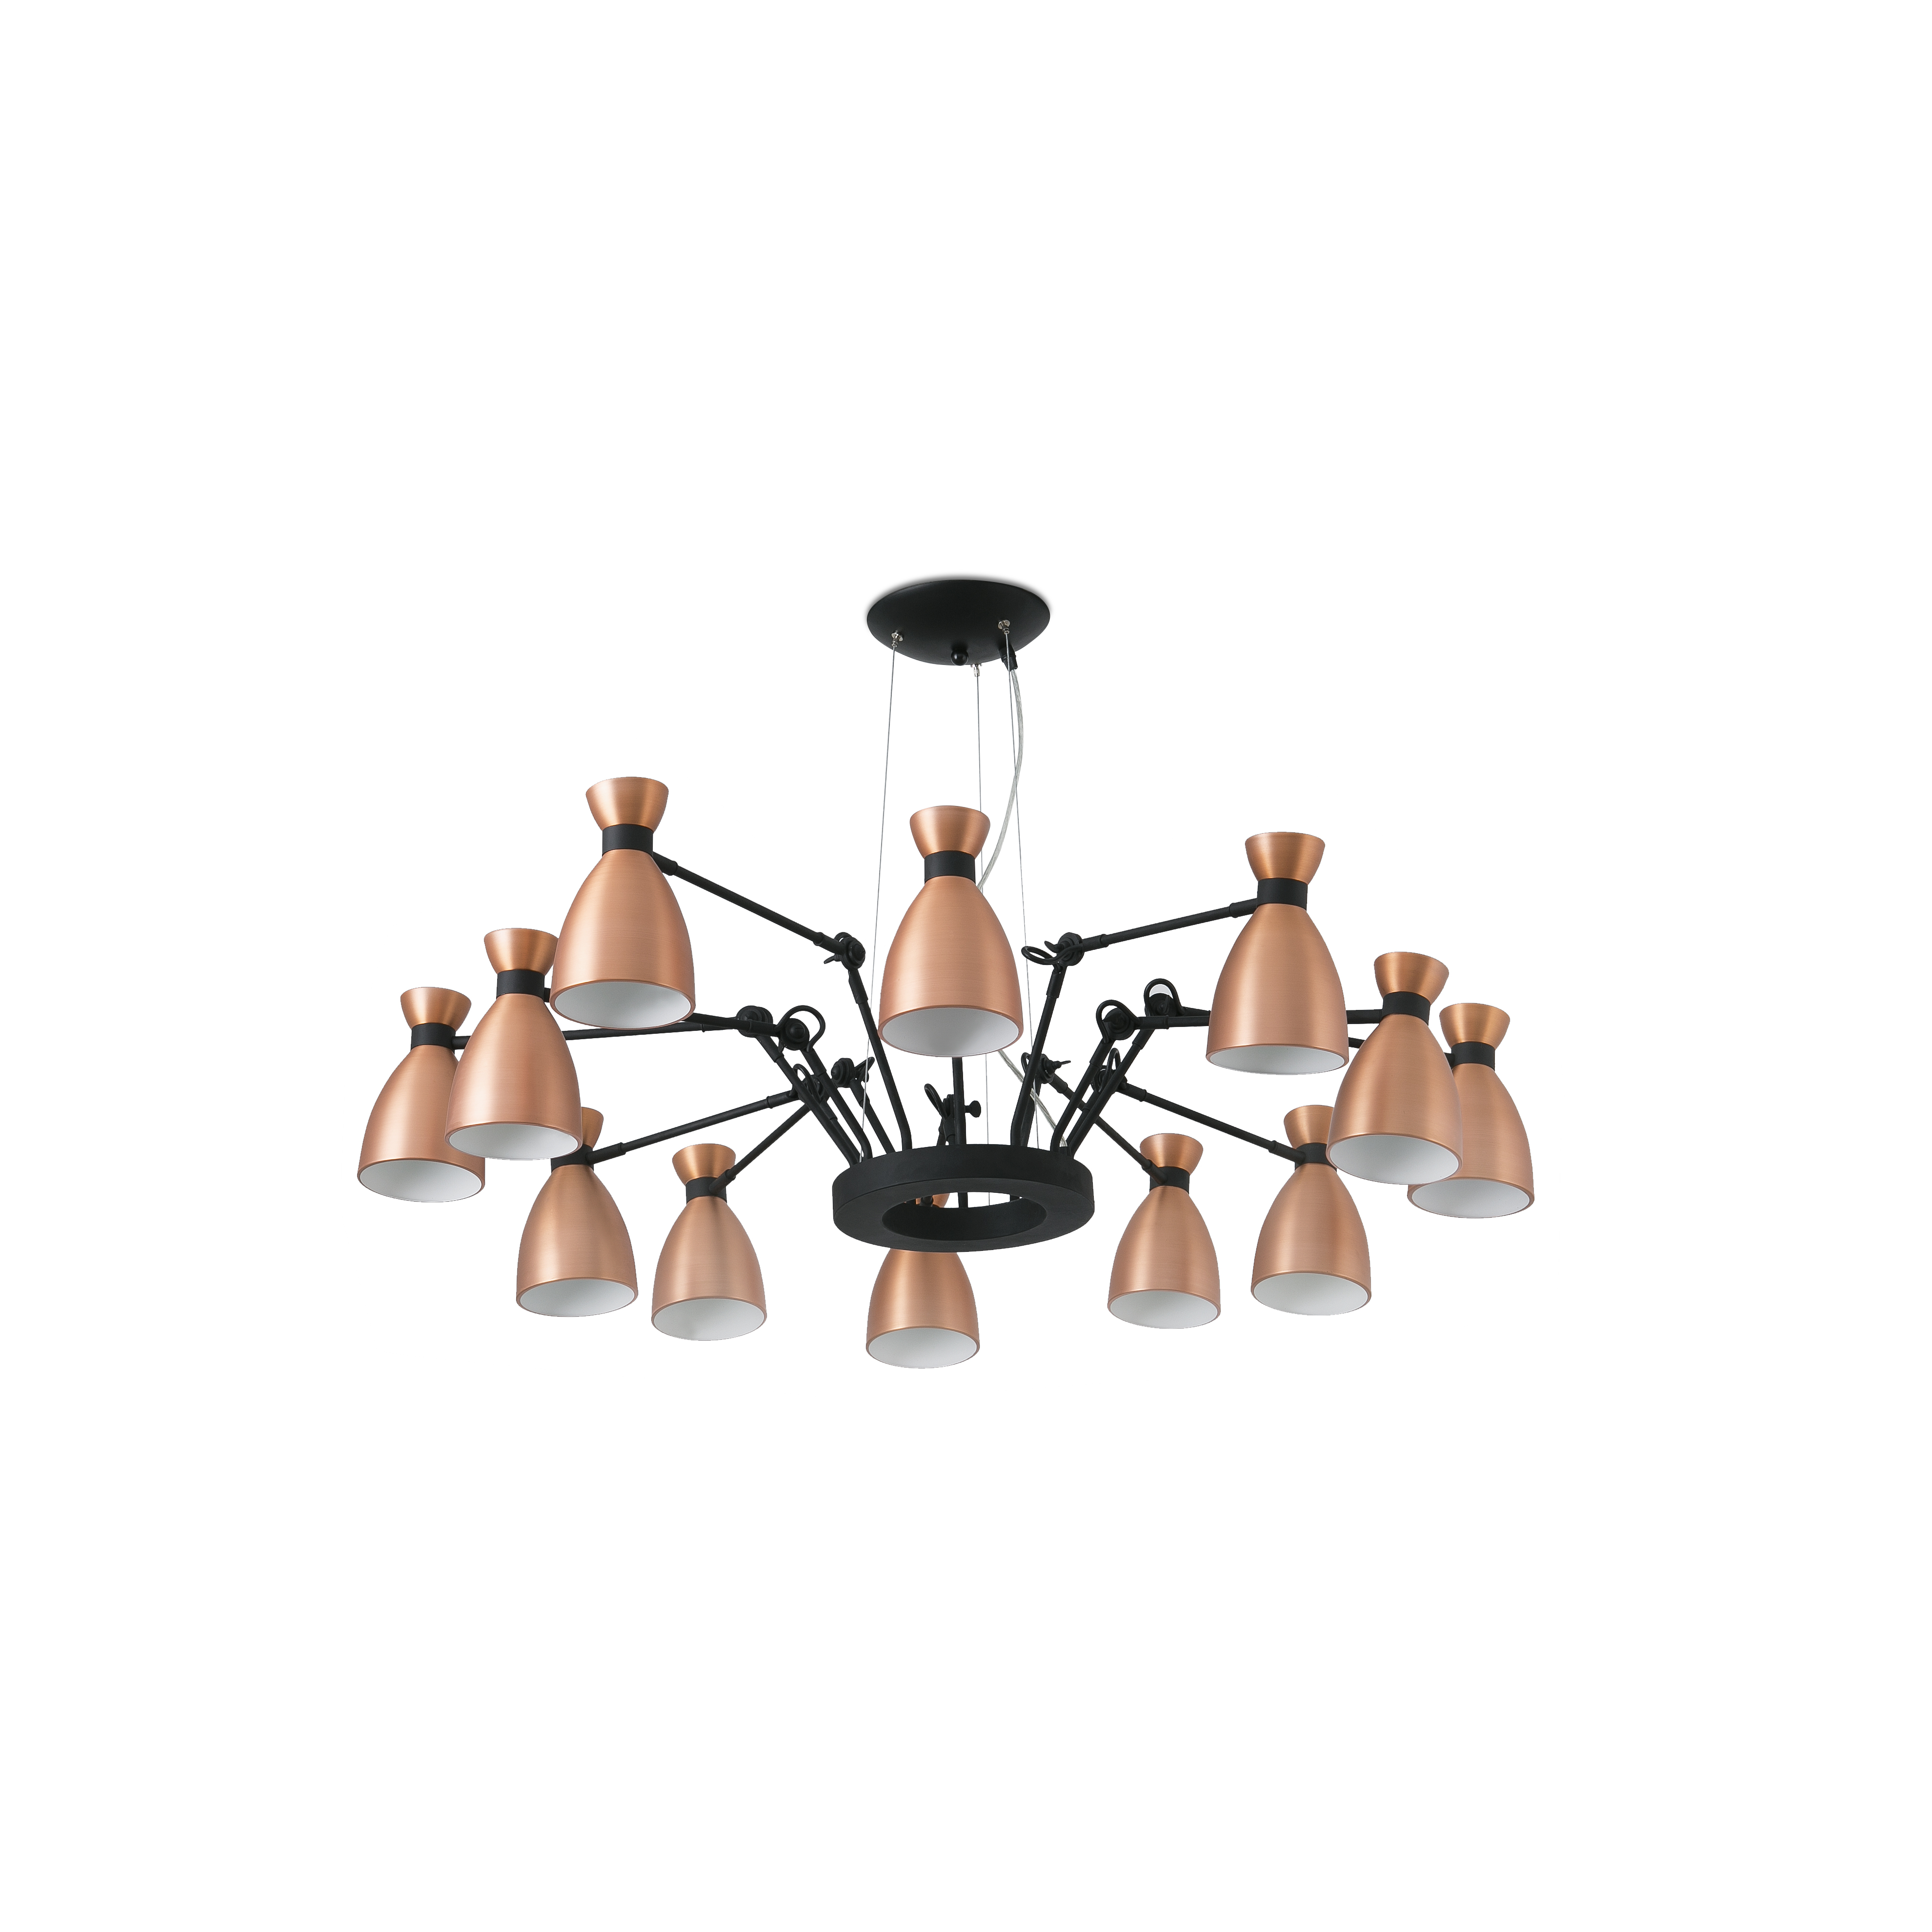 Retro hanglamp 12 armen koper